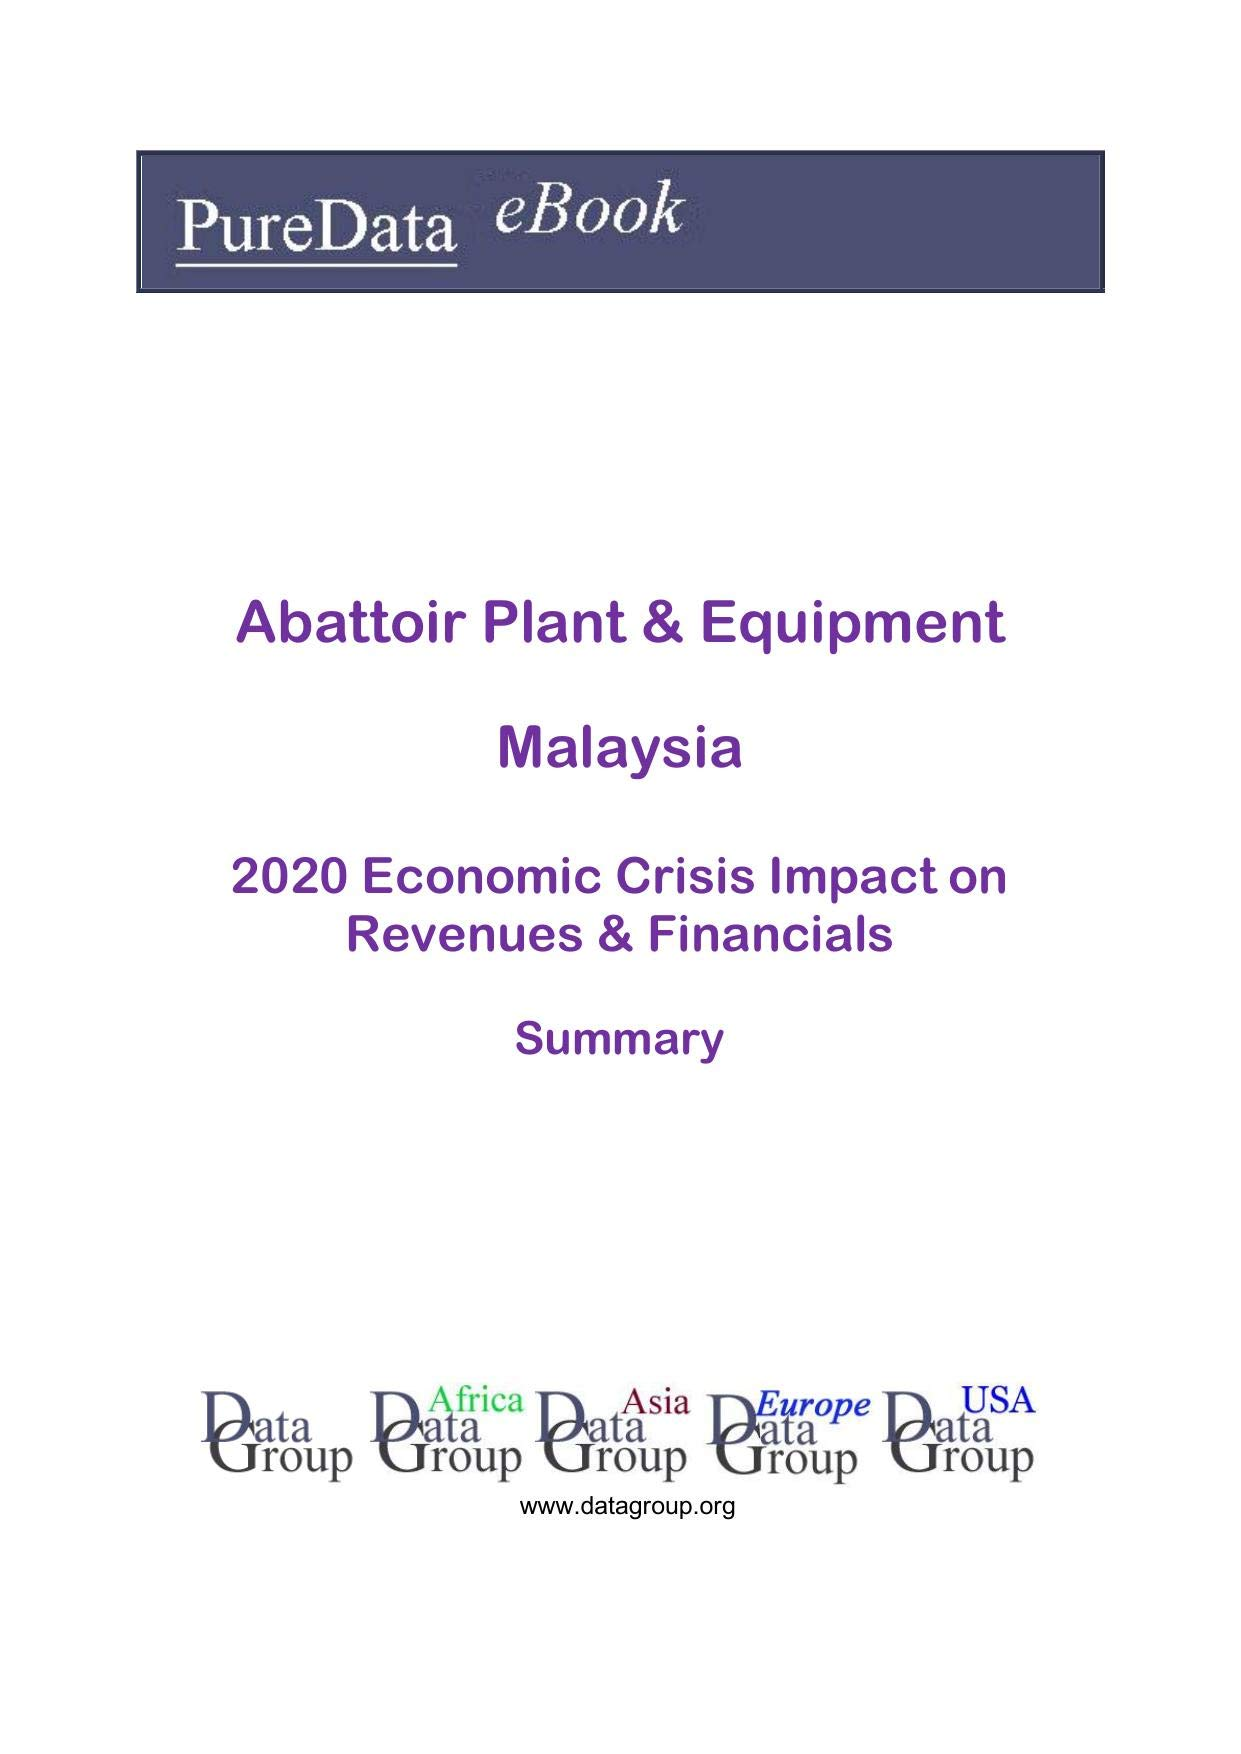 Abattoir Plant & Equipment Malaysia Summary: 2020 Economic Crisis Impact on Revenues & Financials